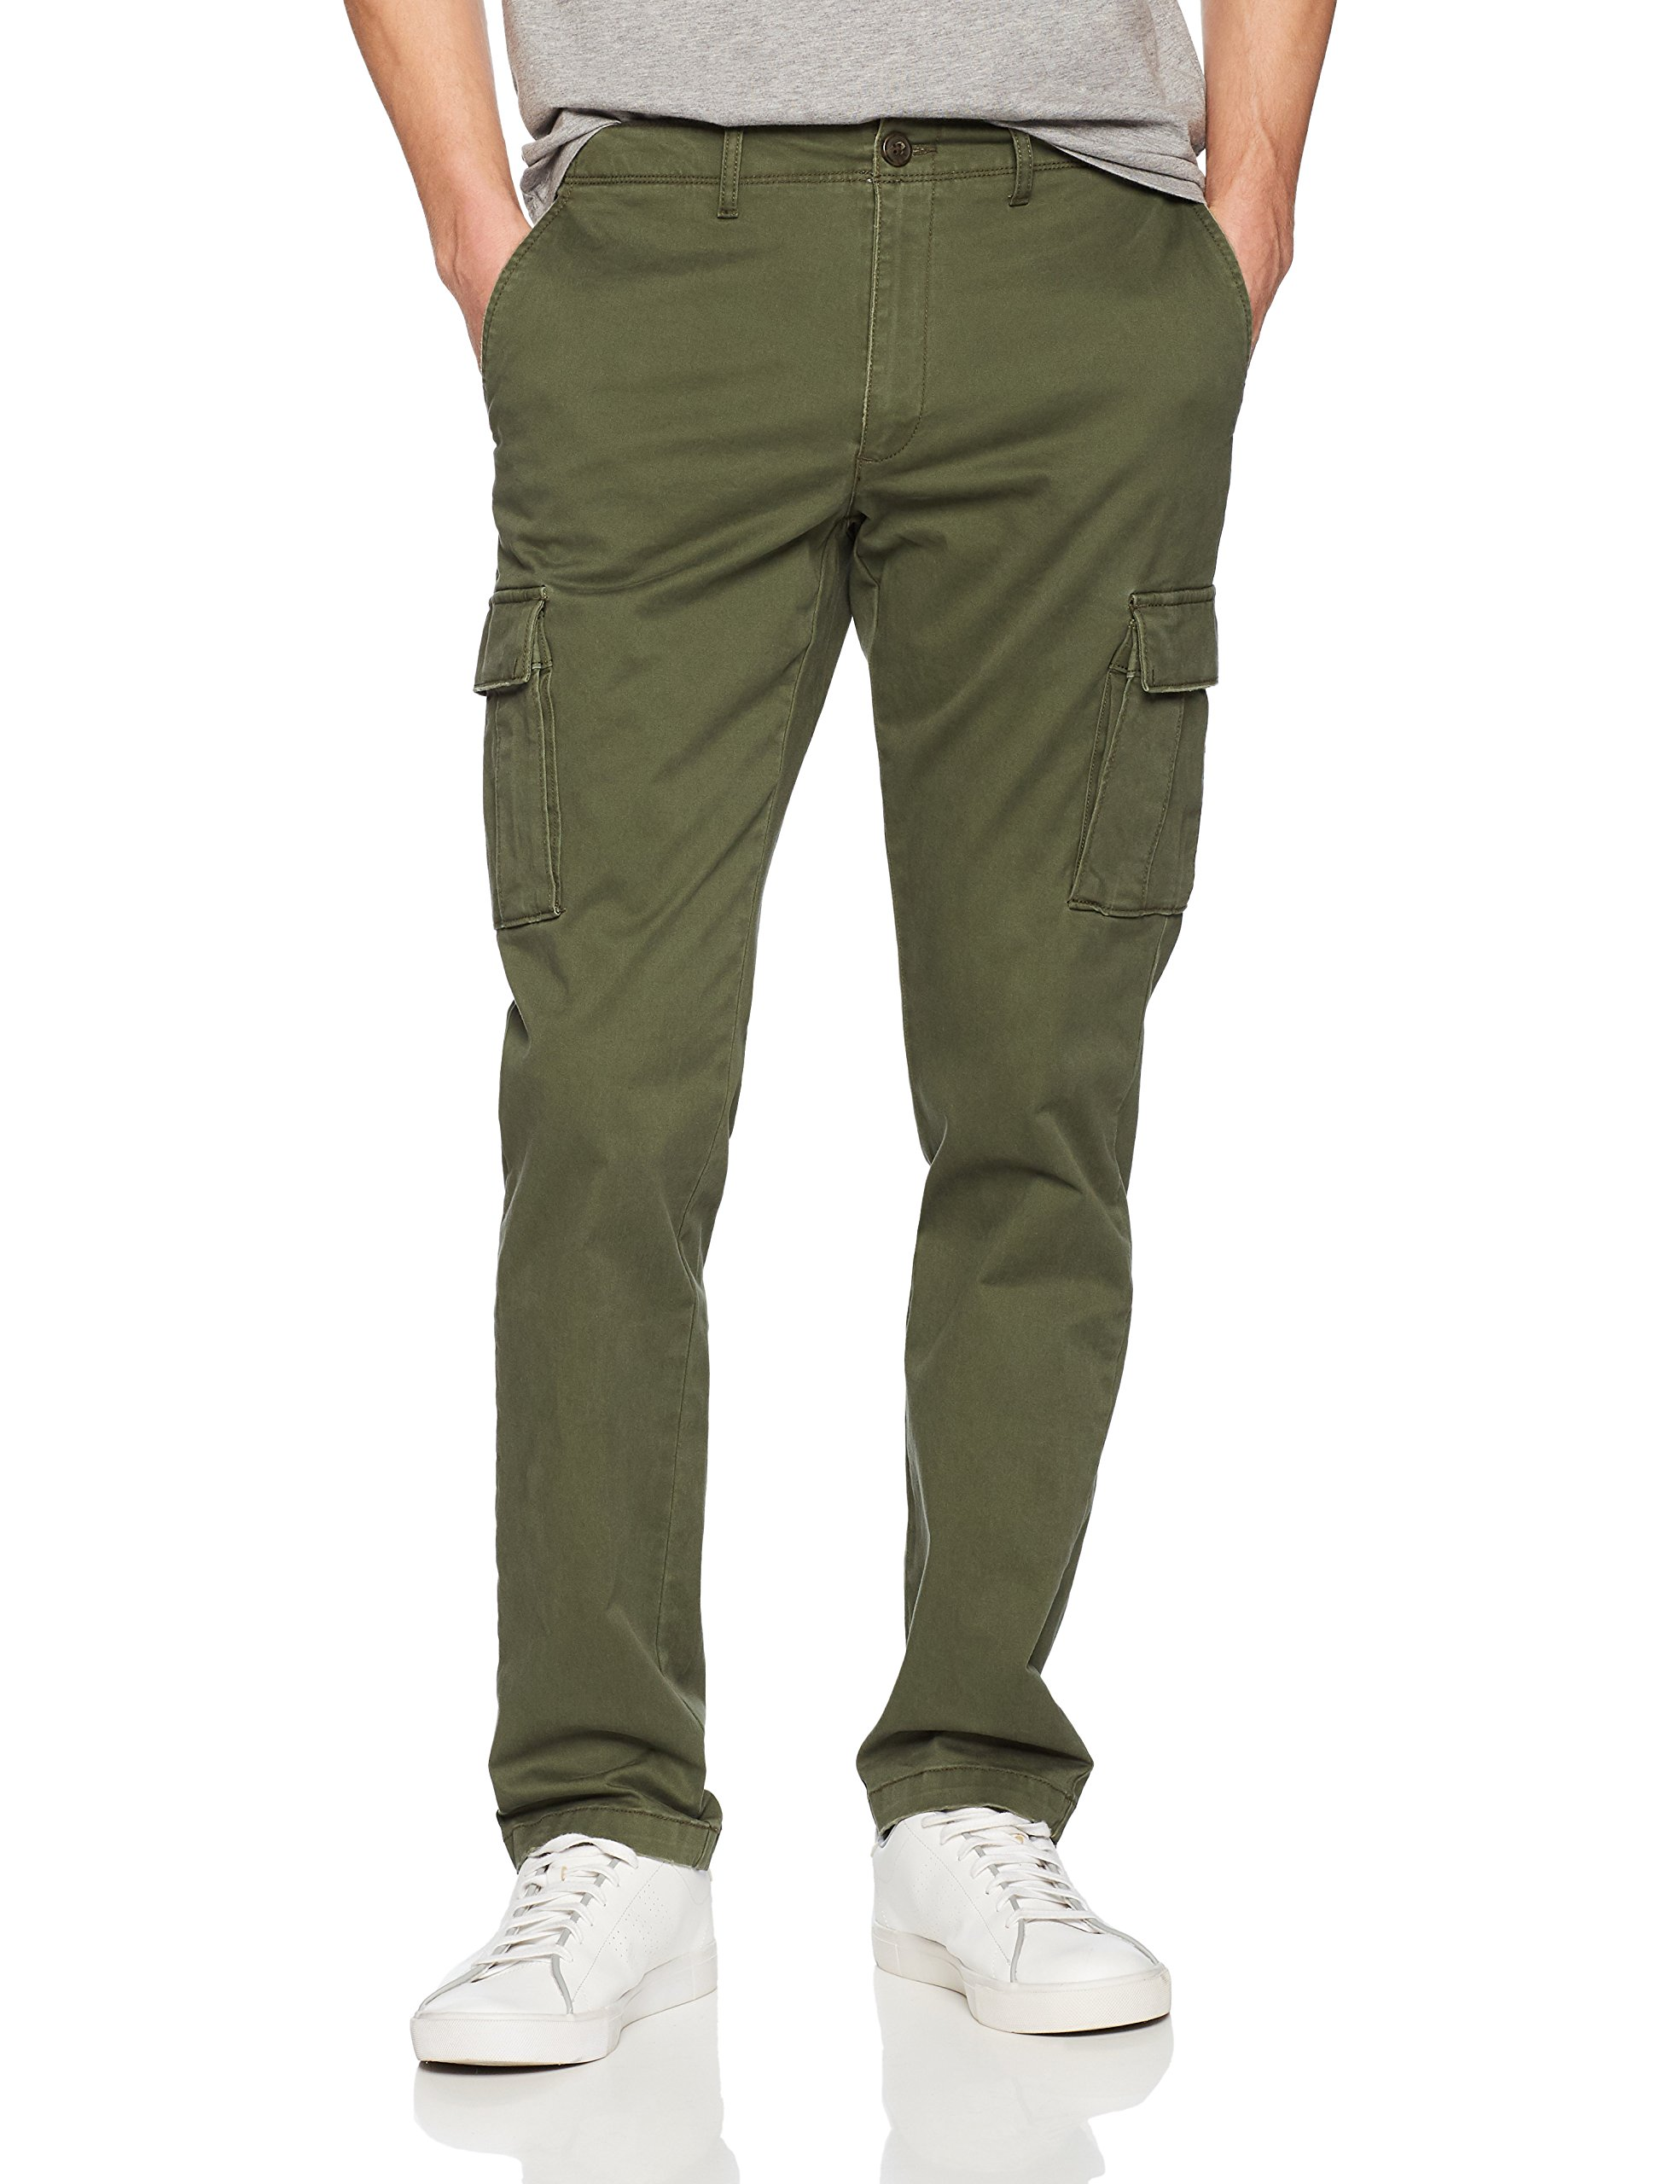 Goodthreads Men's Slim-Fit Vintage Cargo Pant, Deep Depth/Olive, 28W x 32L